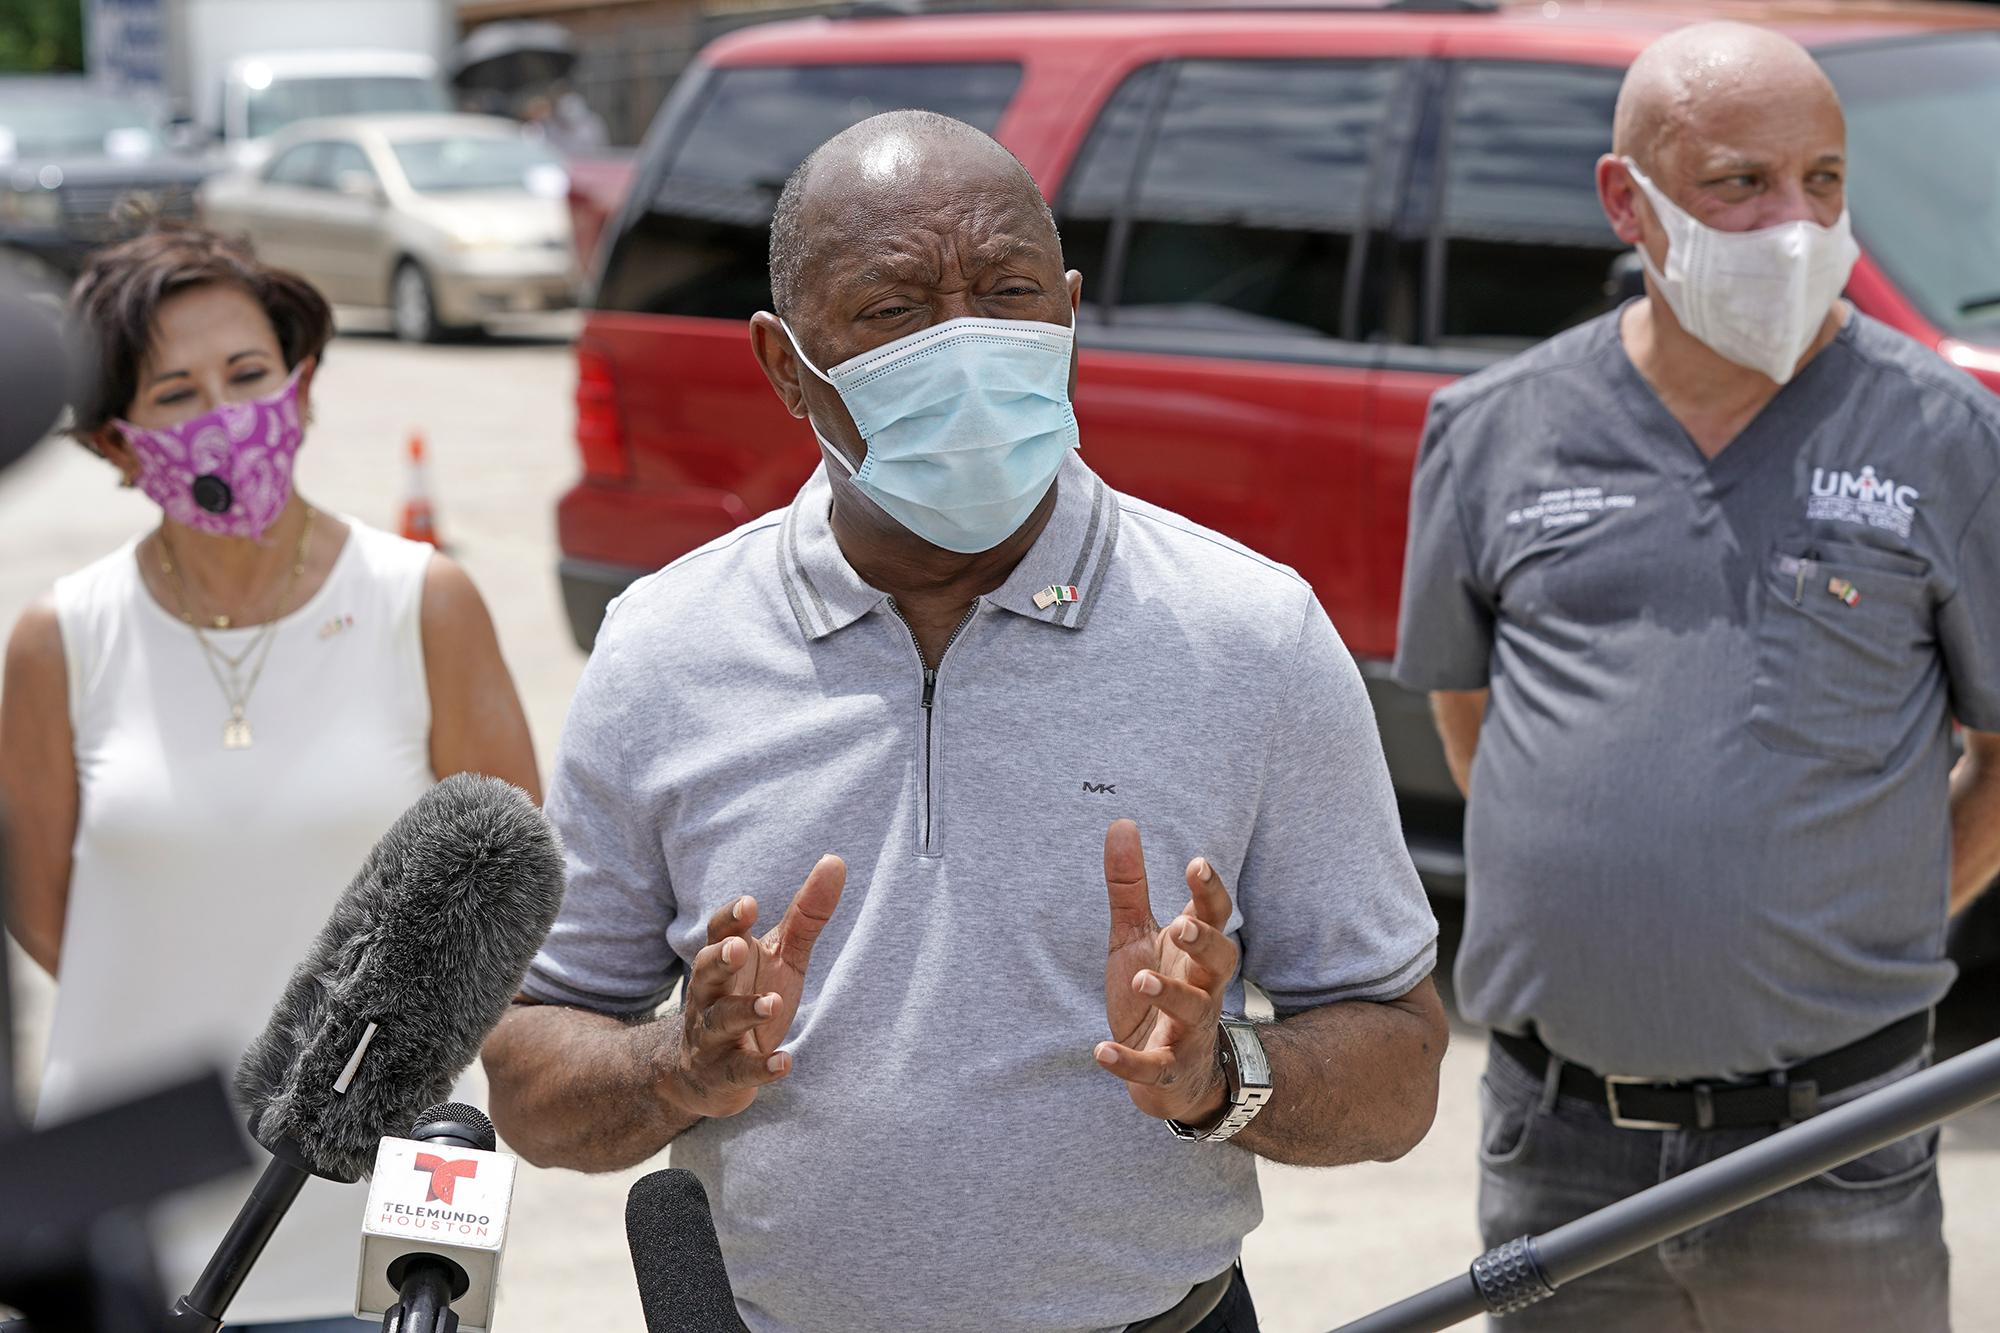 Houston scraps Texas GOP's in-person conference over coronavirus